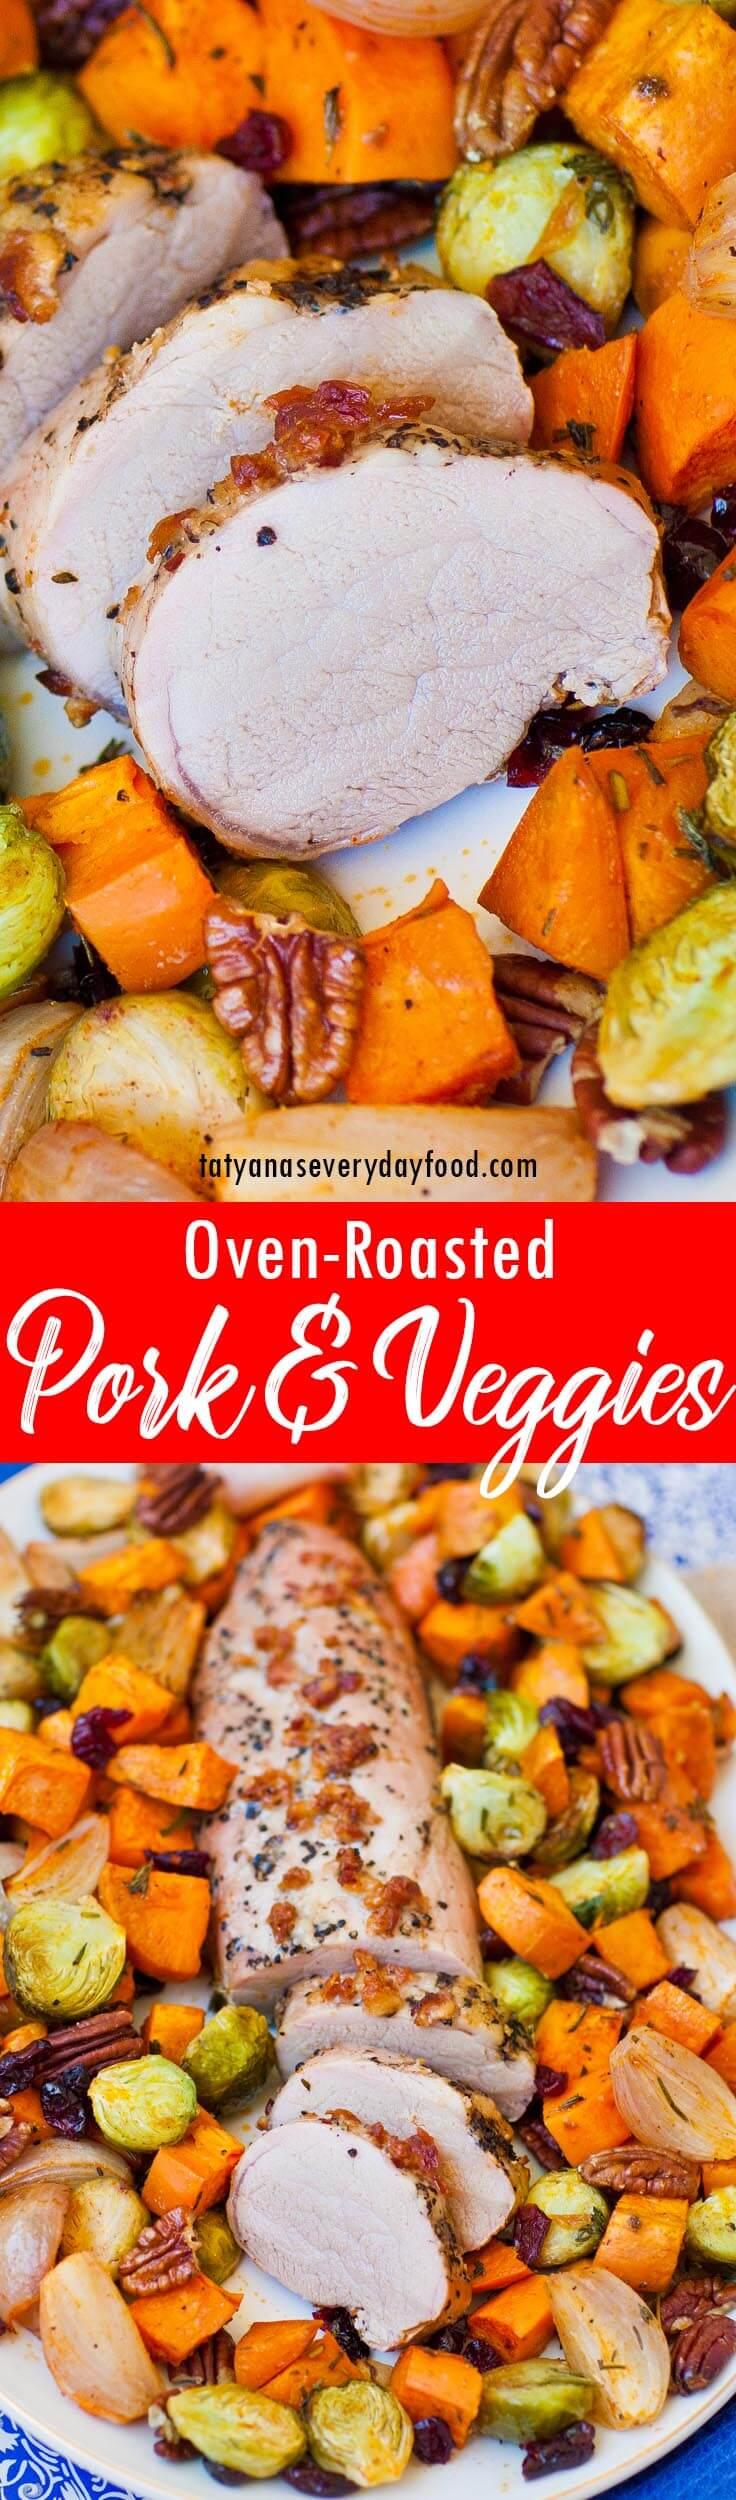 Oven-Roasted Pork with Veggies recipe